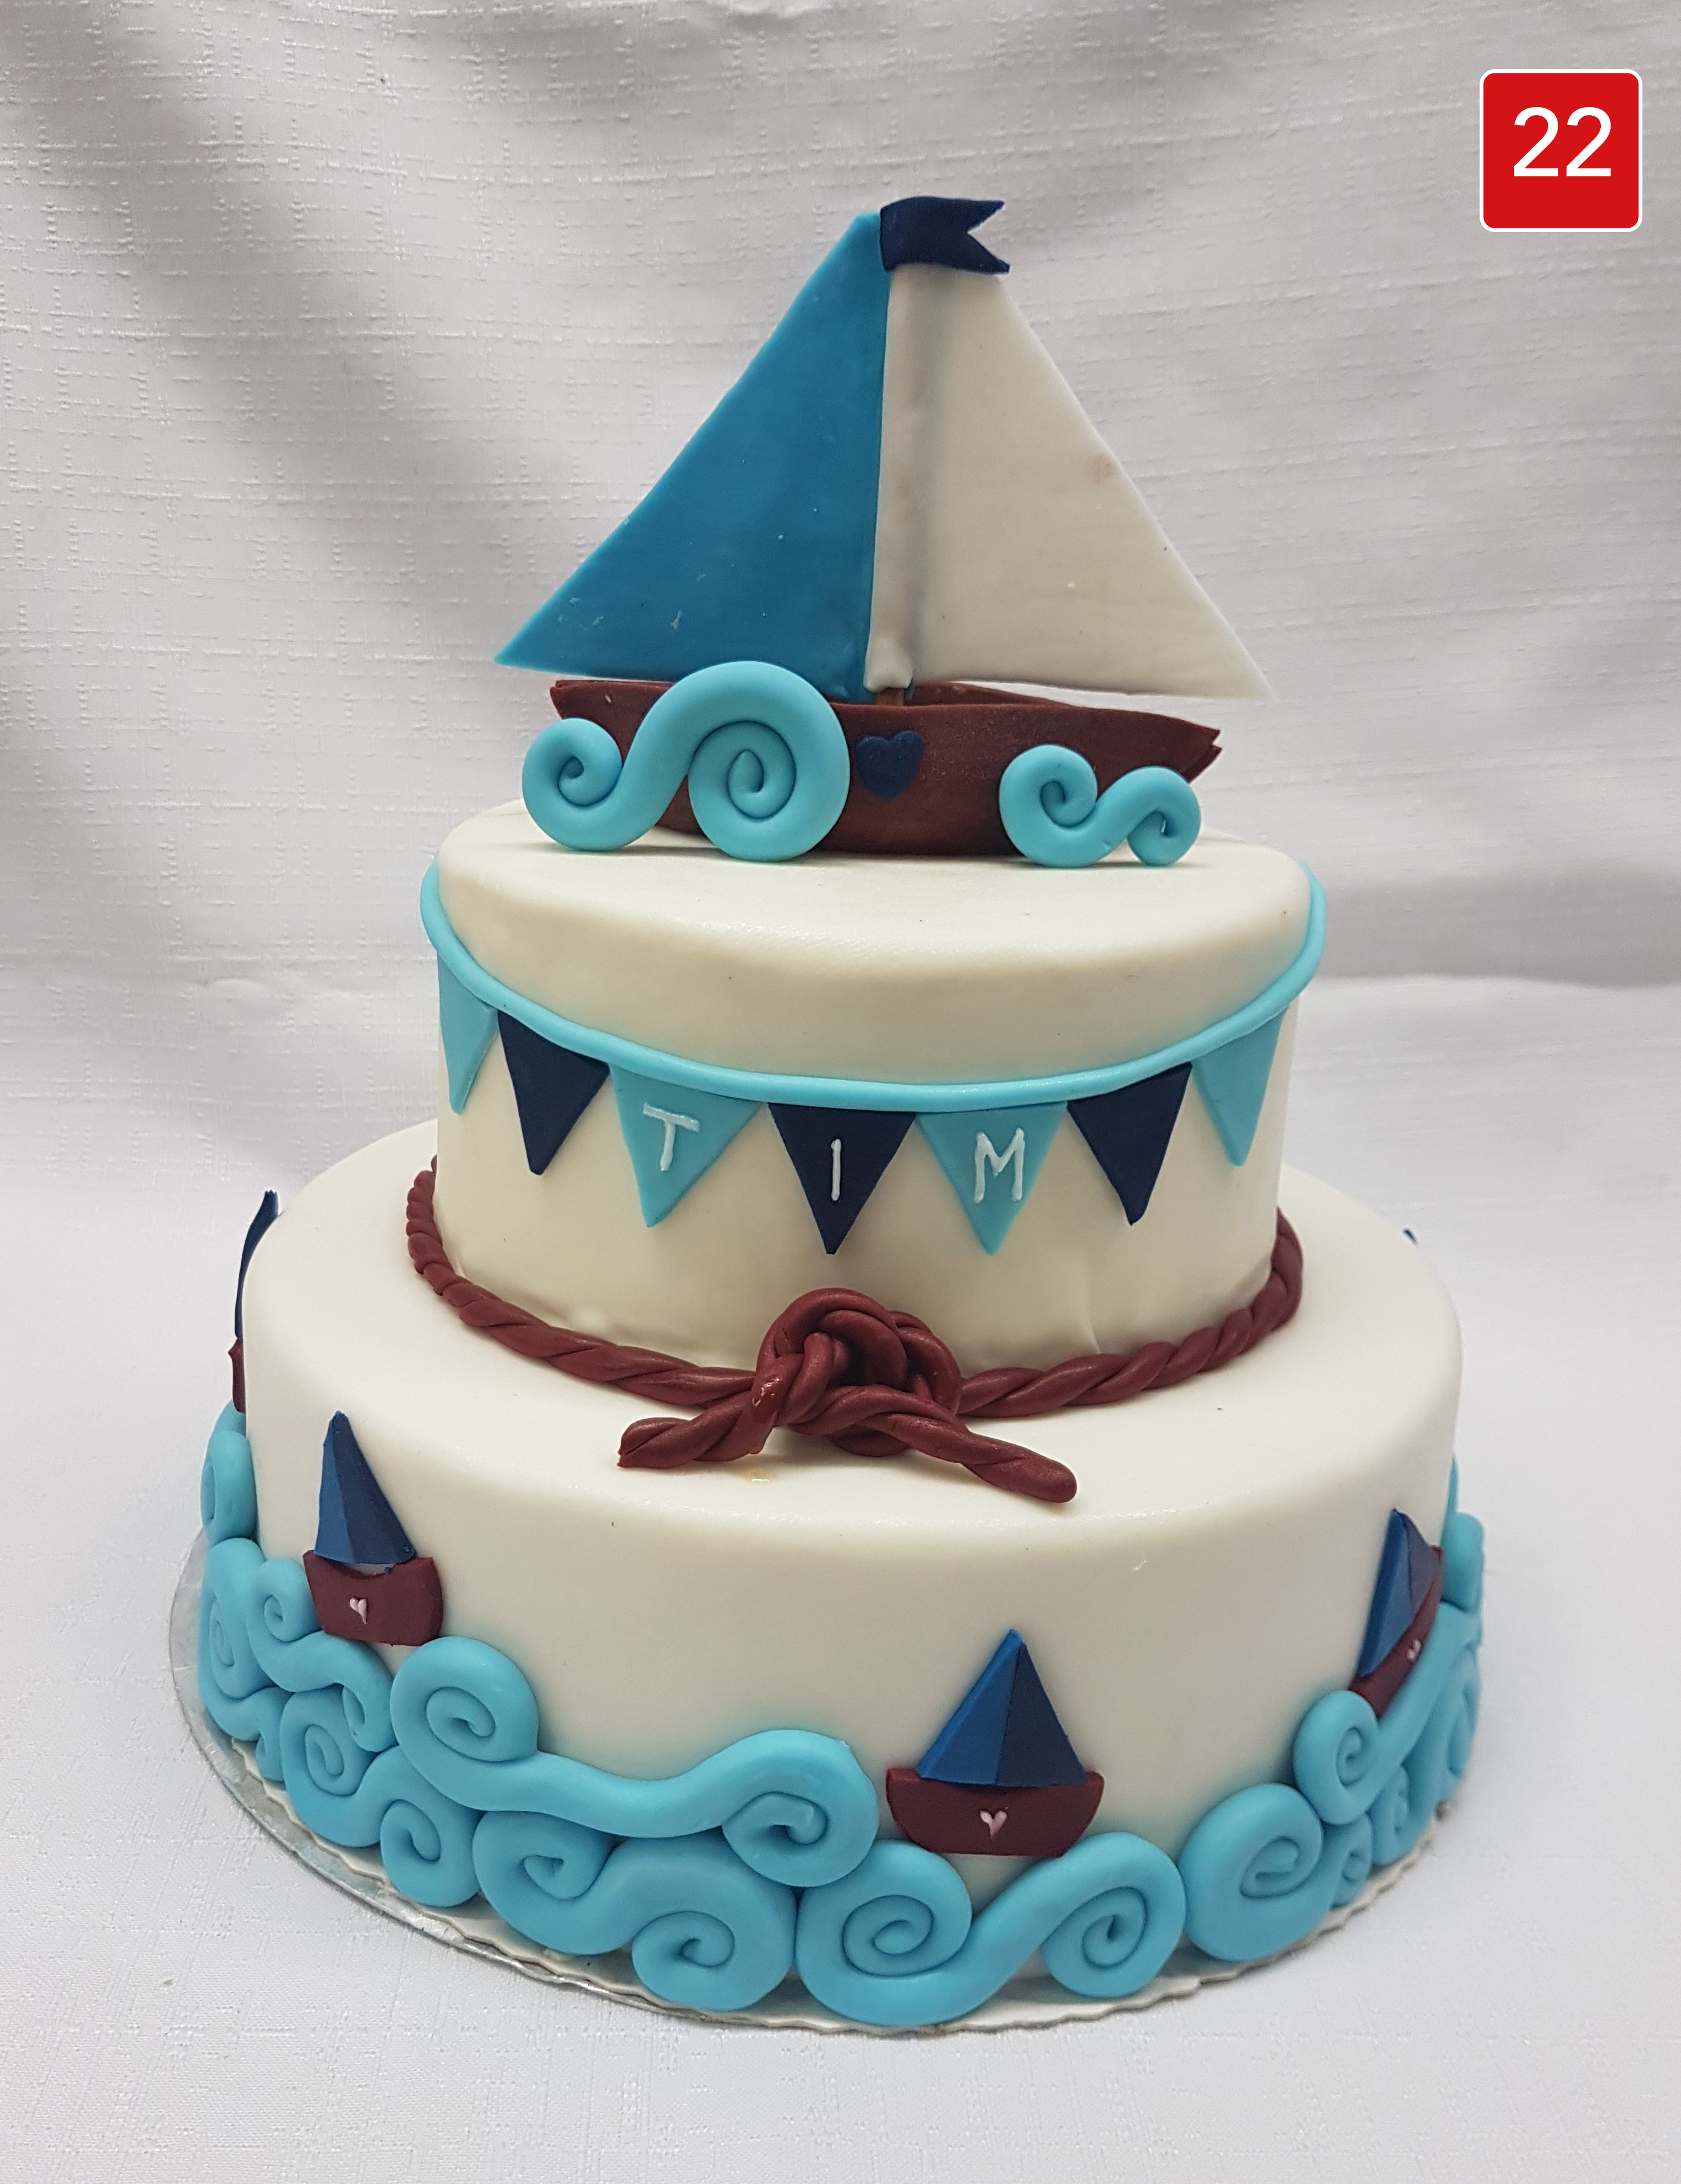 Torte 22